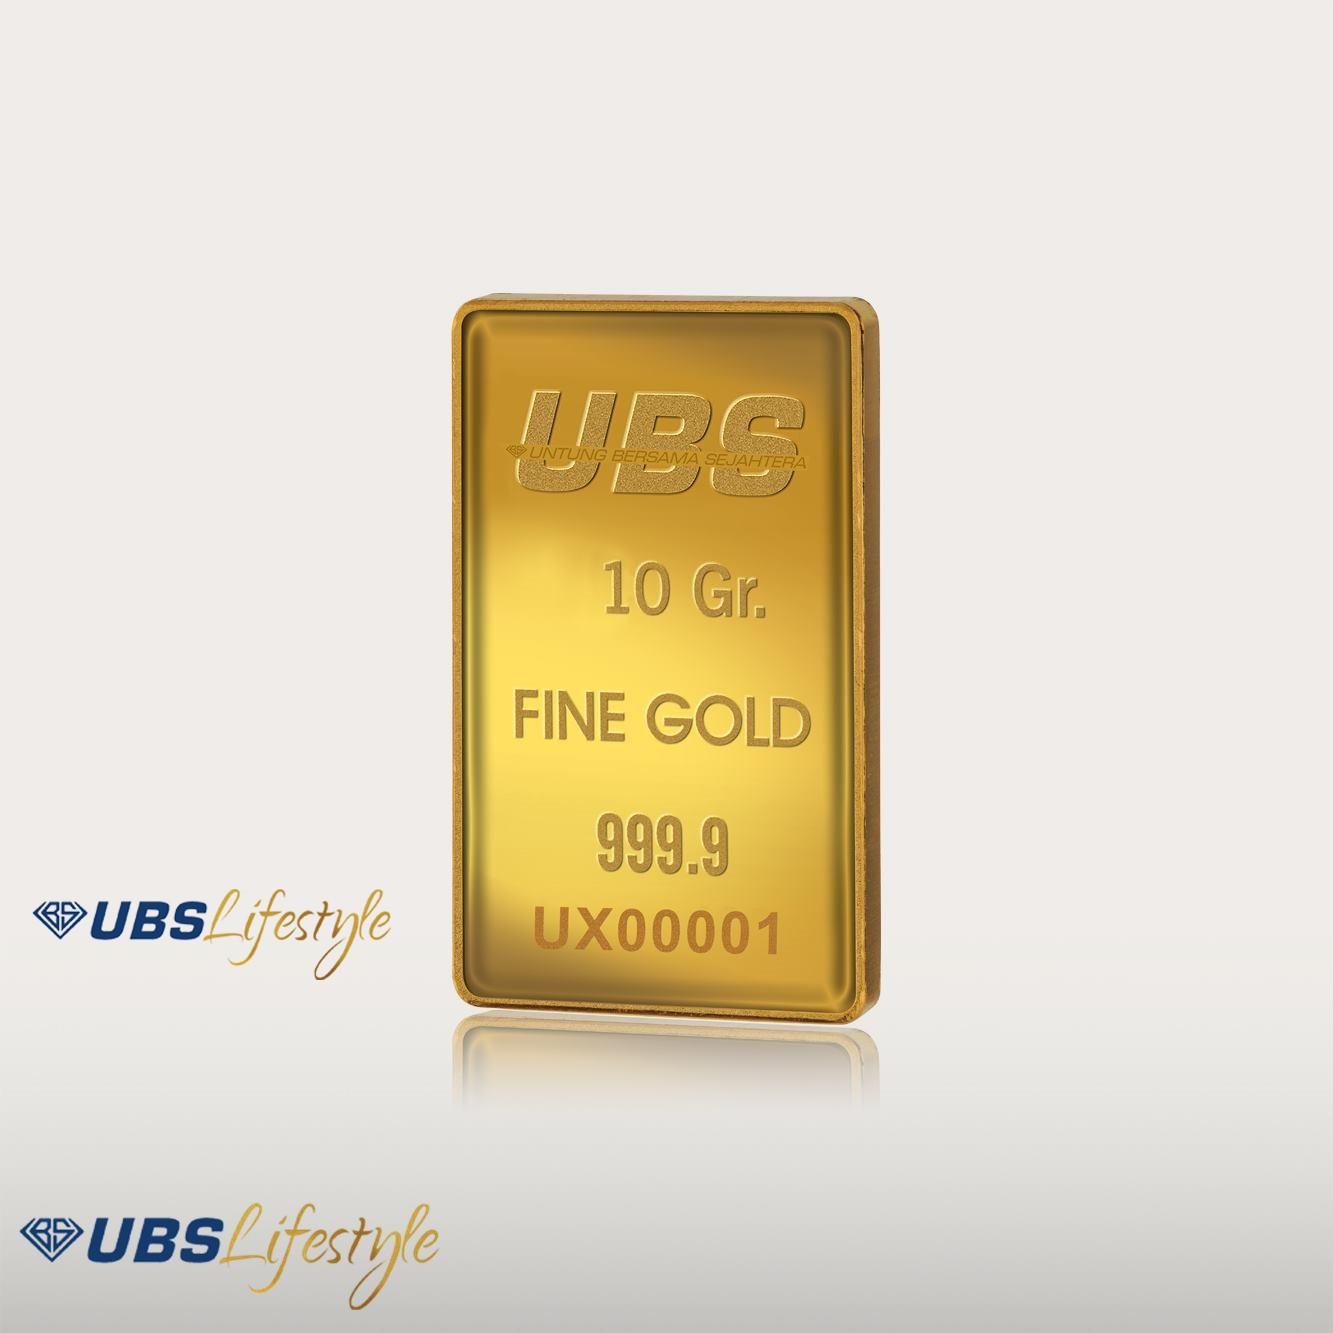 Fine Gold 10gram